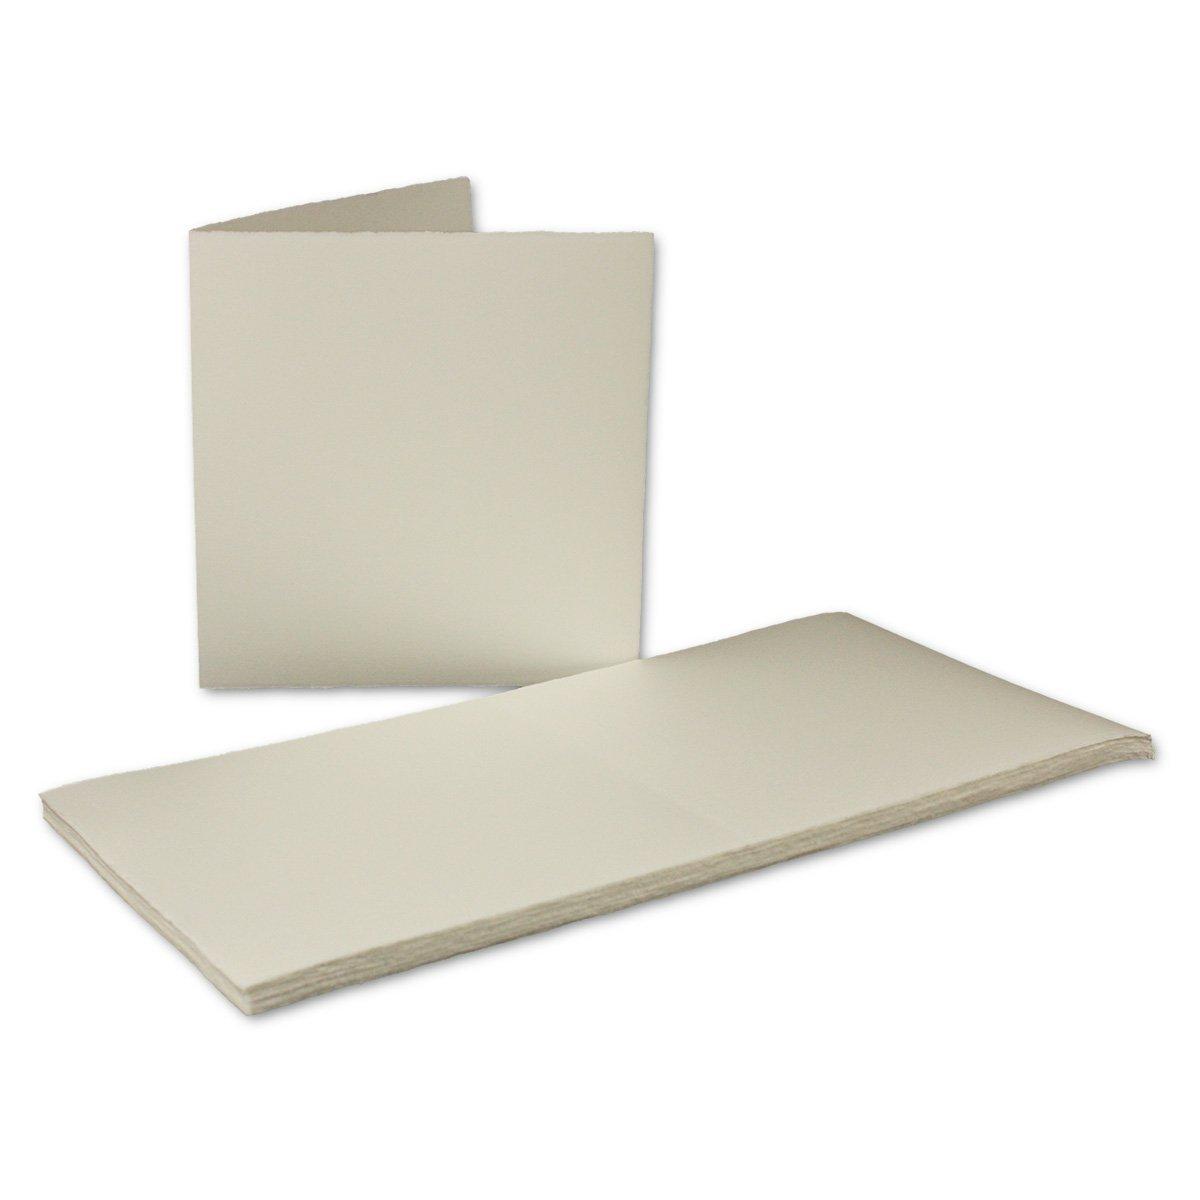 Echtes Büttenpapier | 25er Set | quadratische Doppel-Karten 160 x 160 mm | Naturweiß halbmatt | ORIGINAL ZERKALL-BÜTTEN - Serie IDA | Handgemacht - Made in Germany Neuser